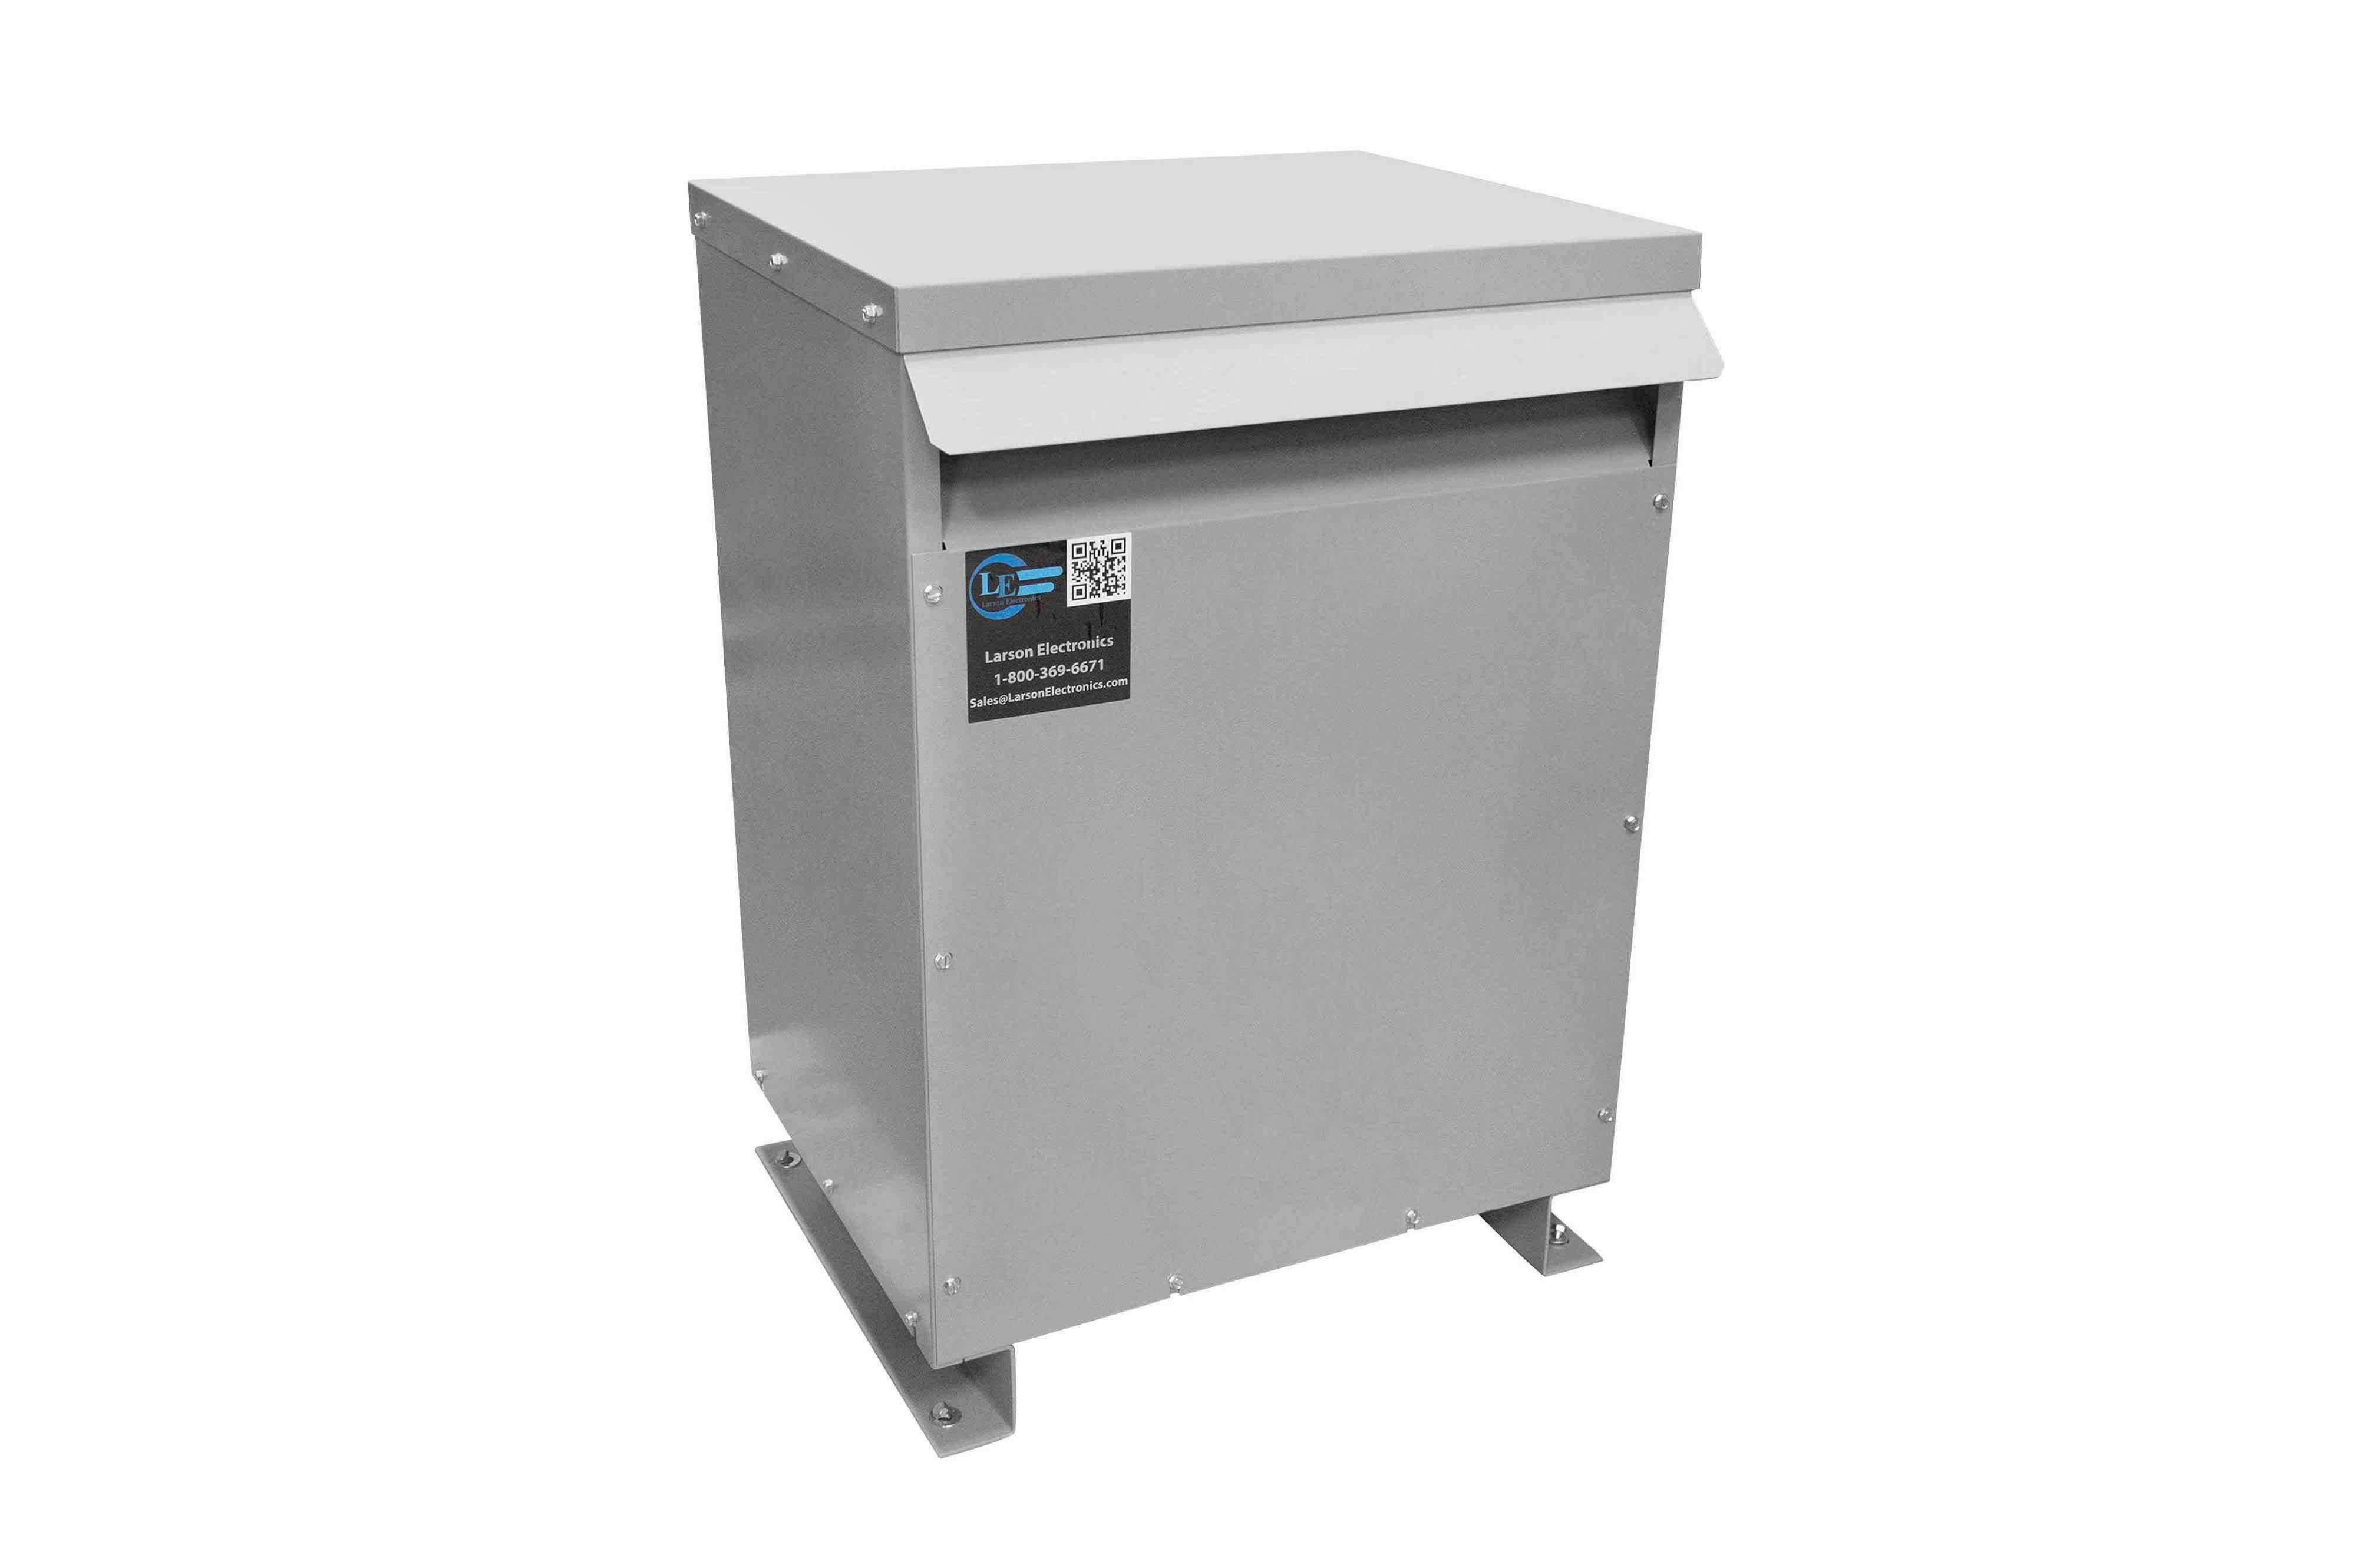 27 kVA 3PH Isolation Transformer, 460V Wye Primary, 380V Delta Secondary, N3R, Ventilated, 60 Hz